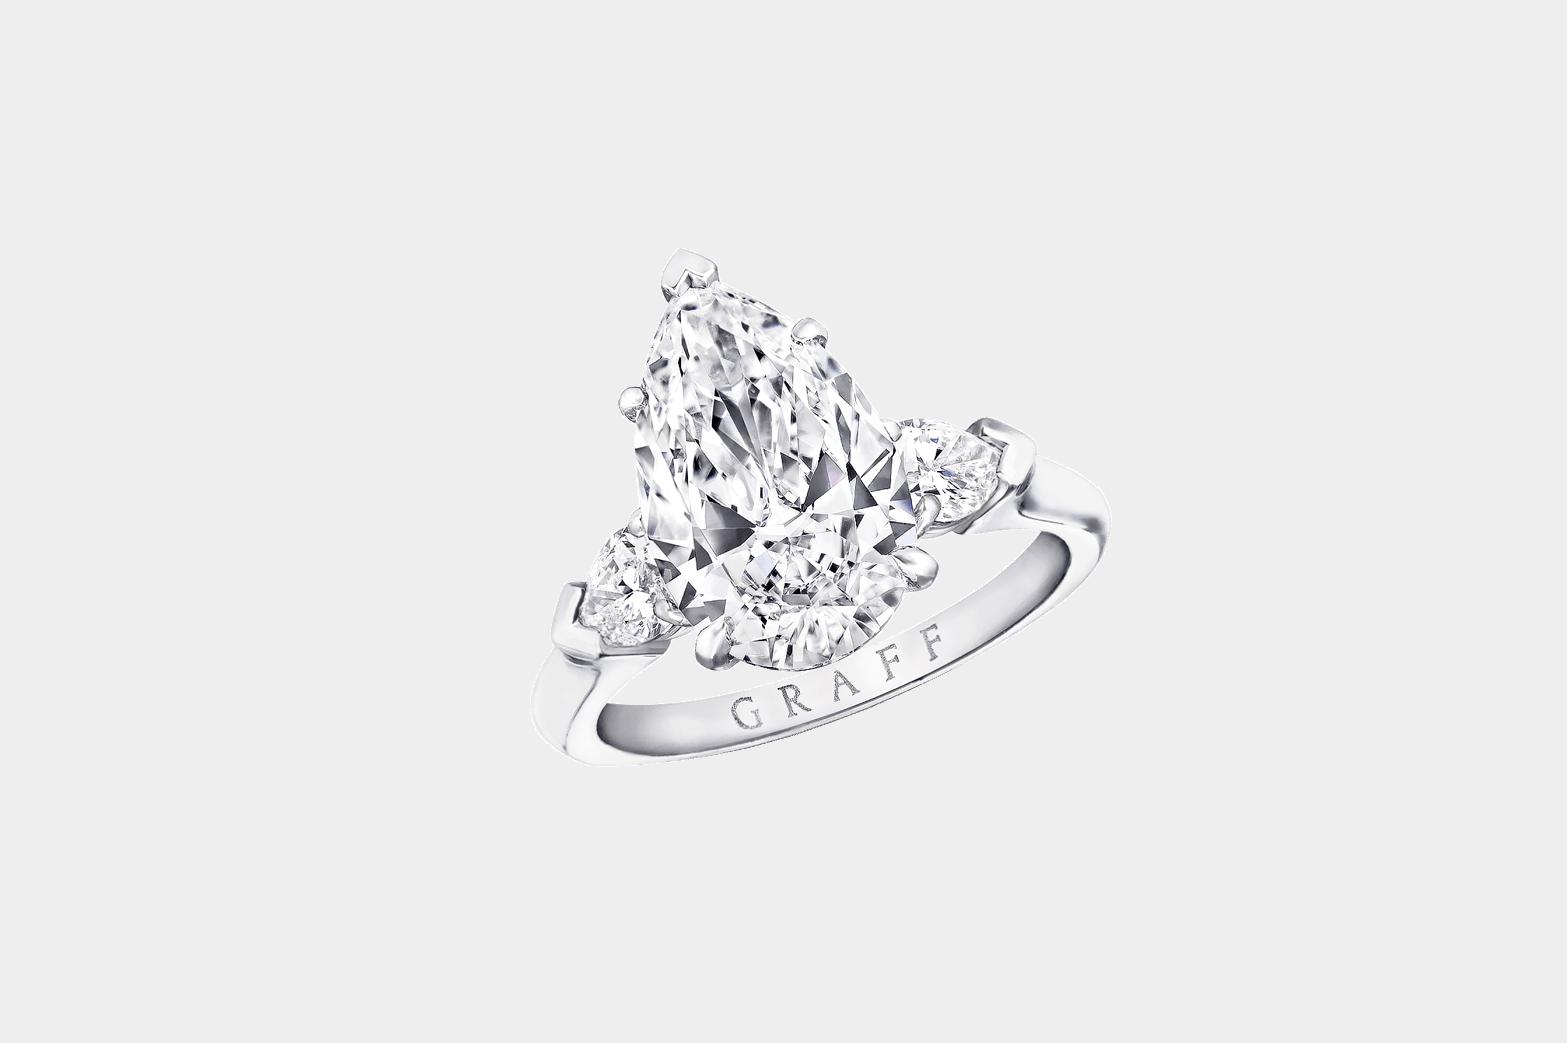 Graff Promise pear shape diamond ring